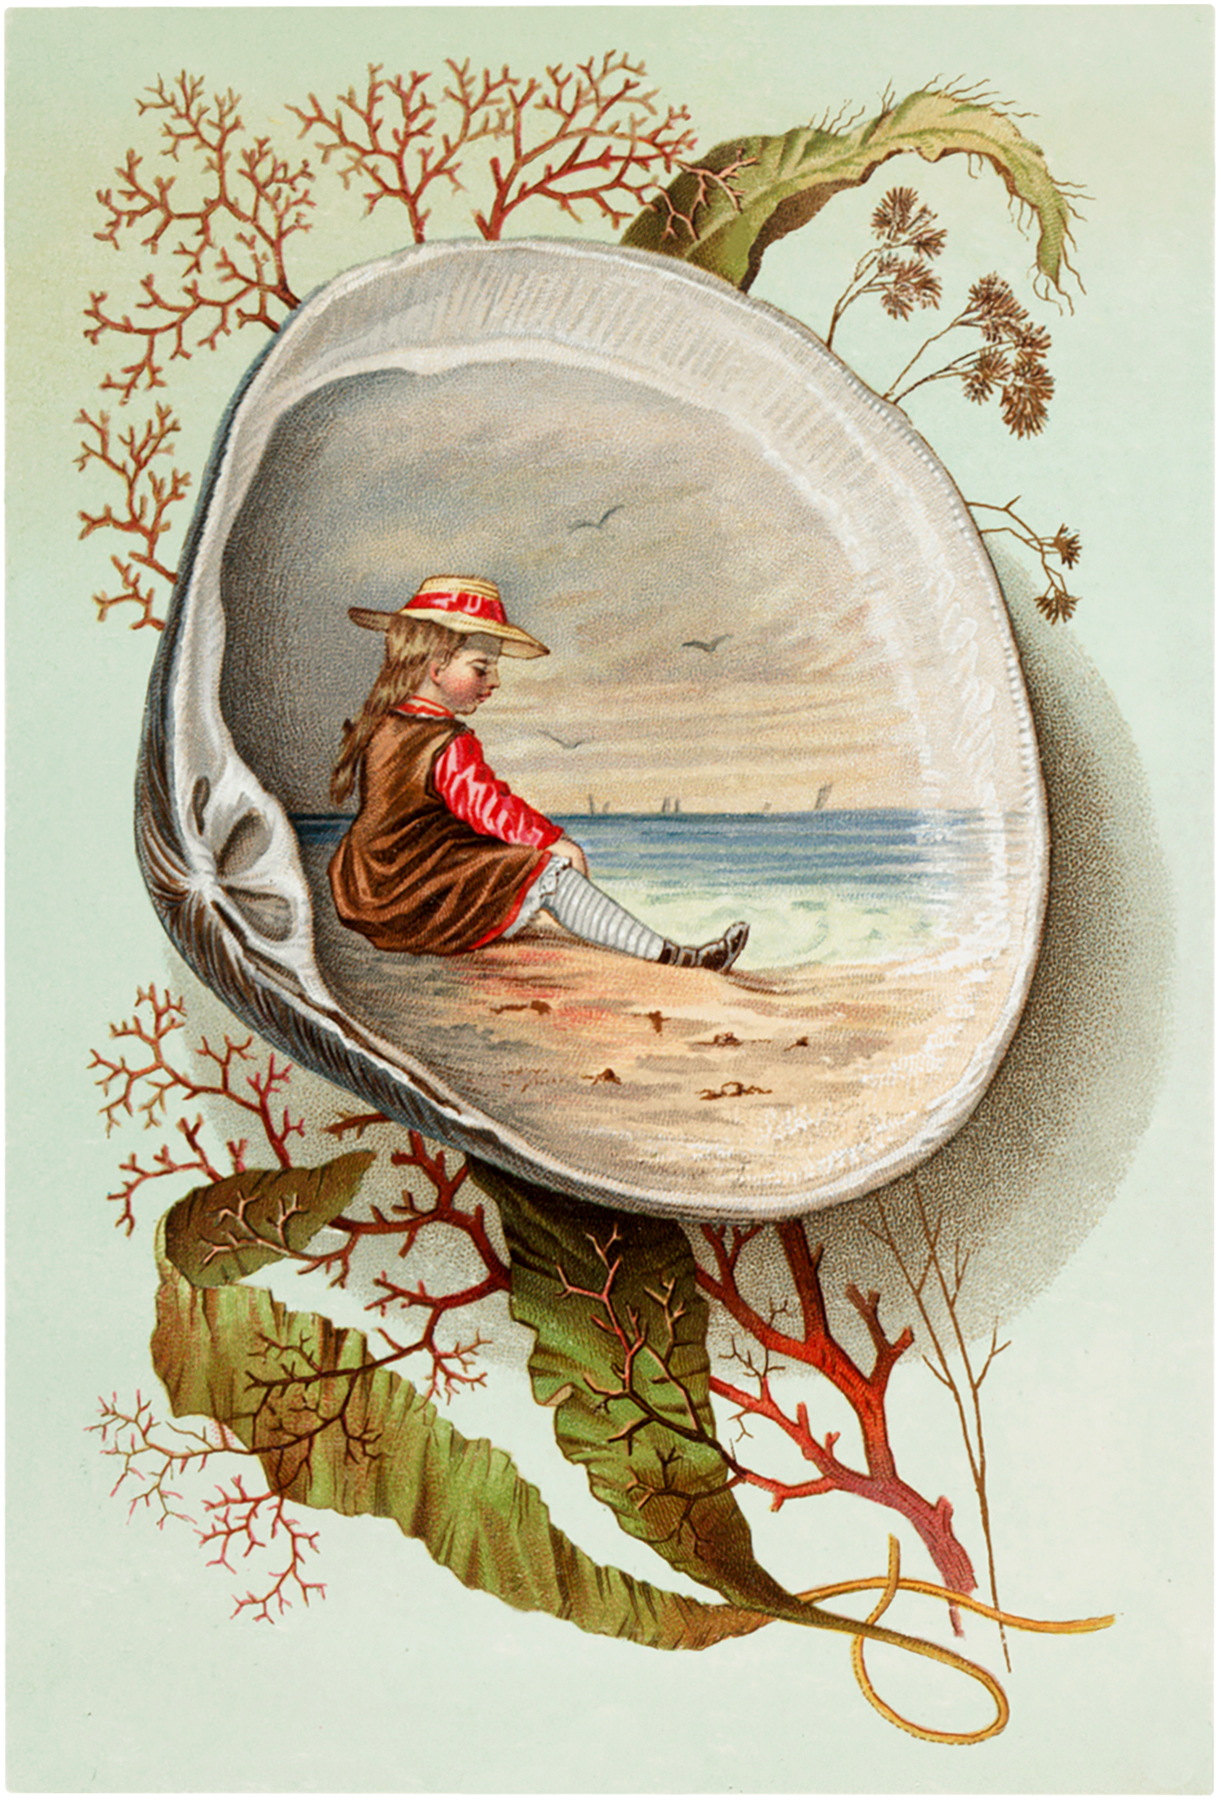 Vintage Clam Shell Scene Image